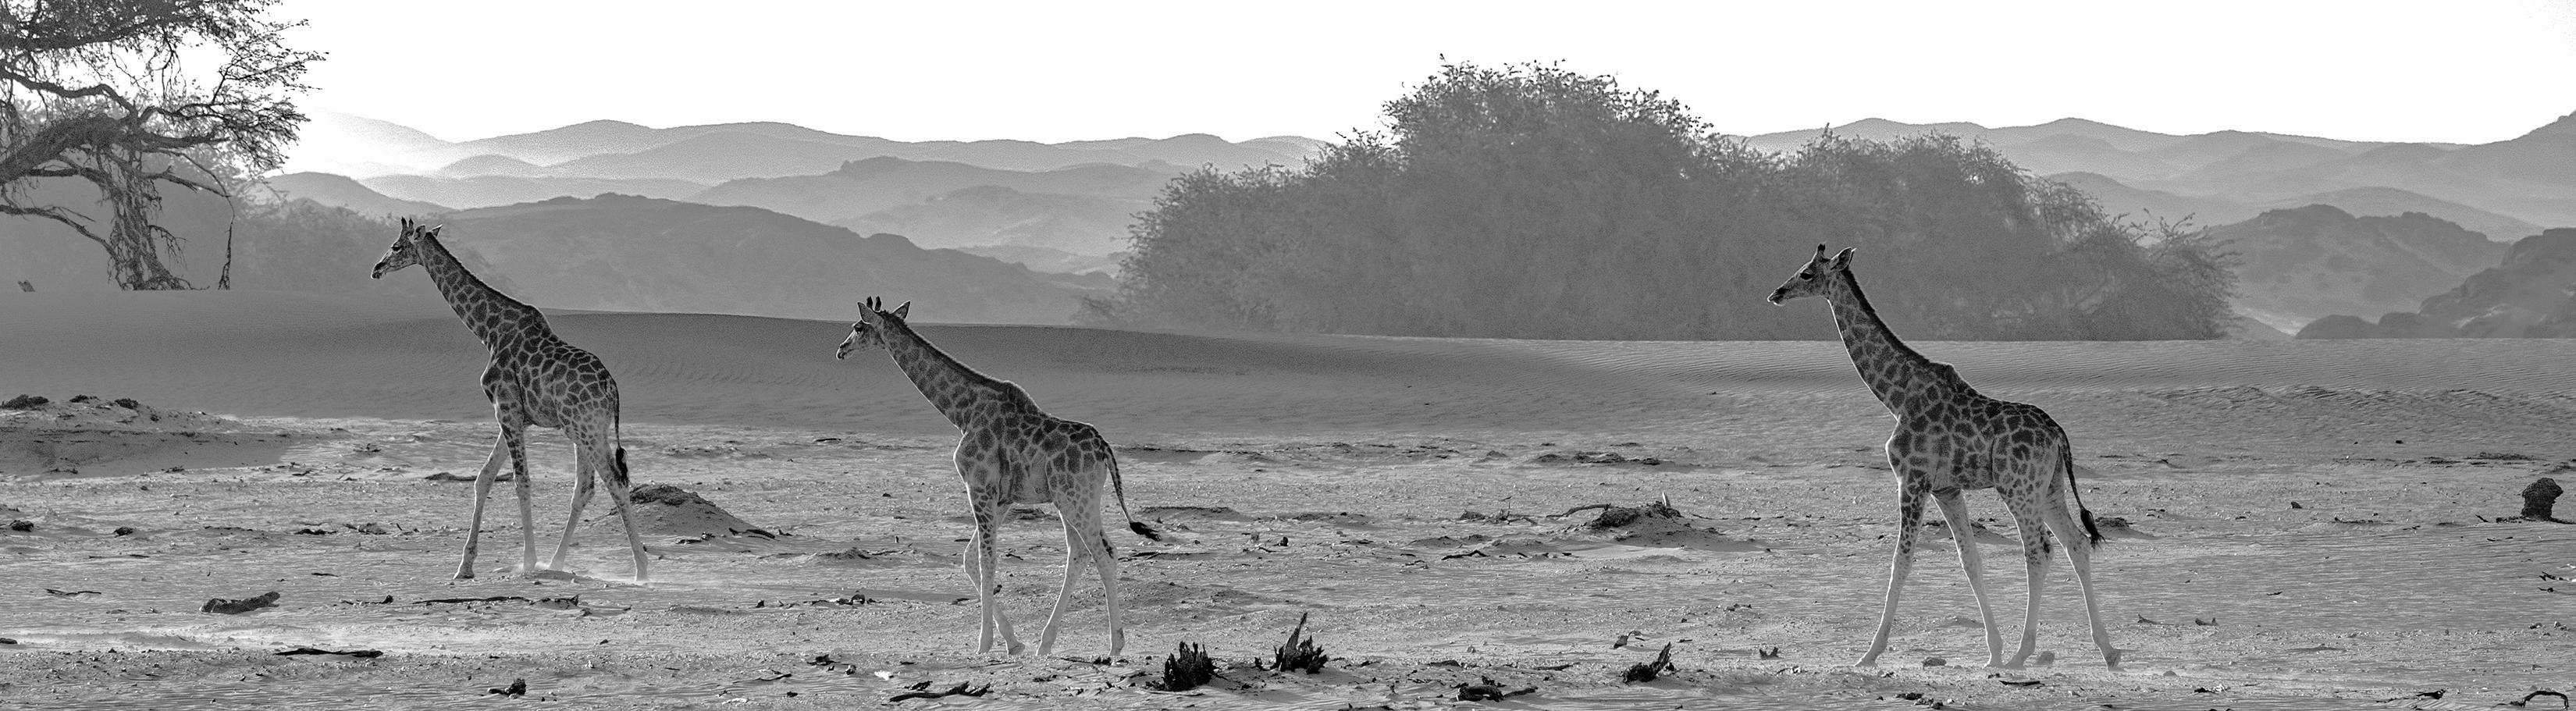 75O0587_sunlit_giraffes_B_W_editLR